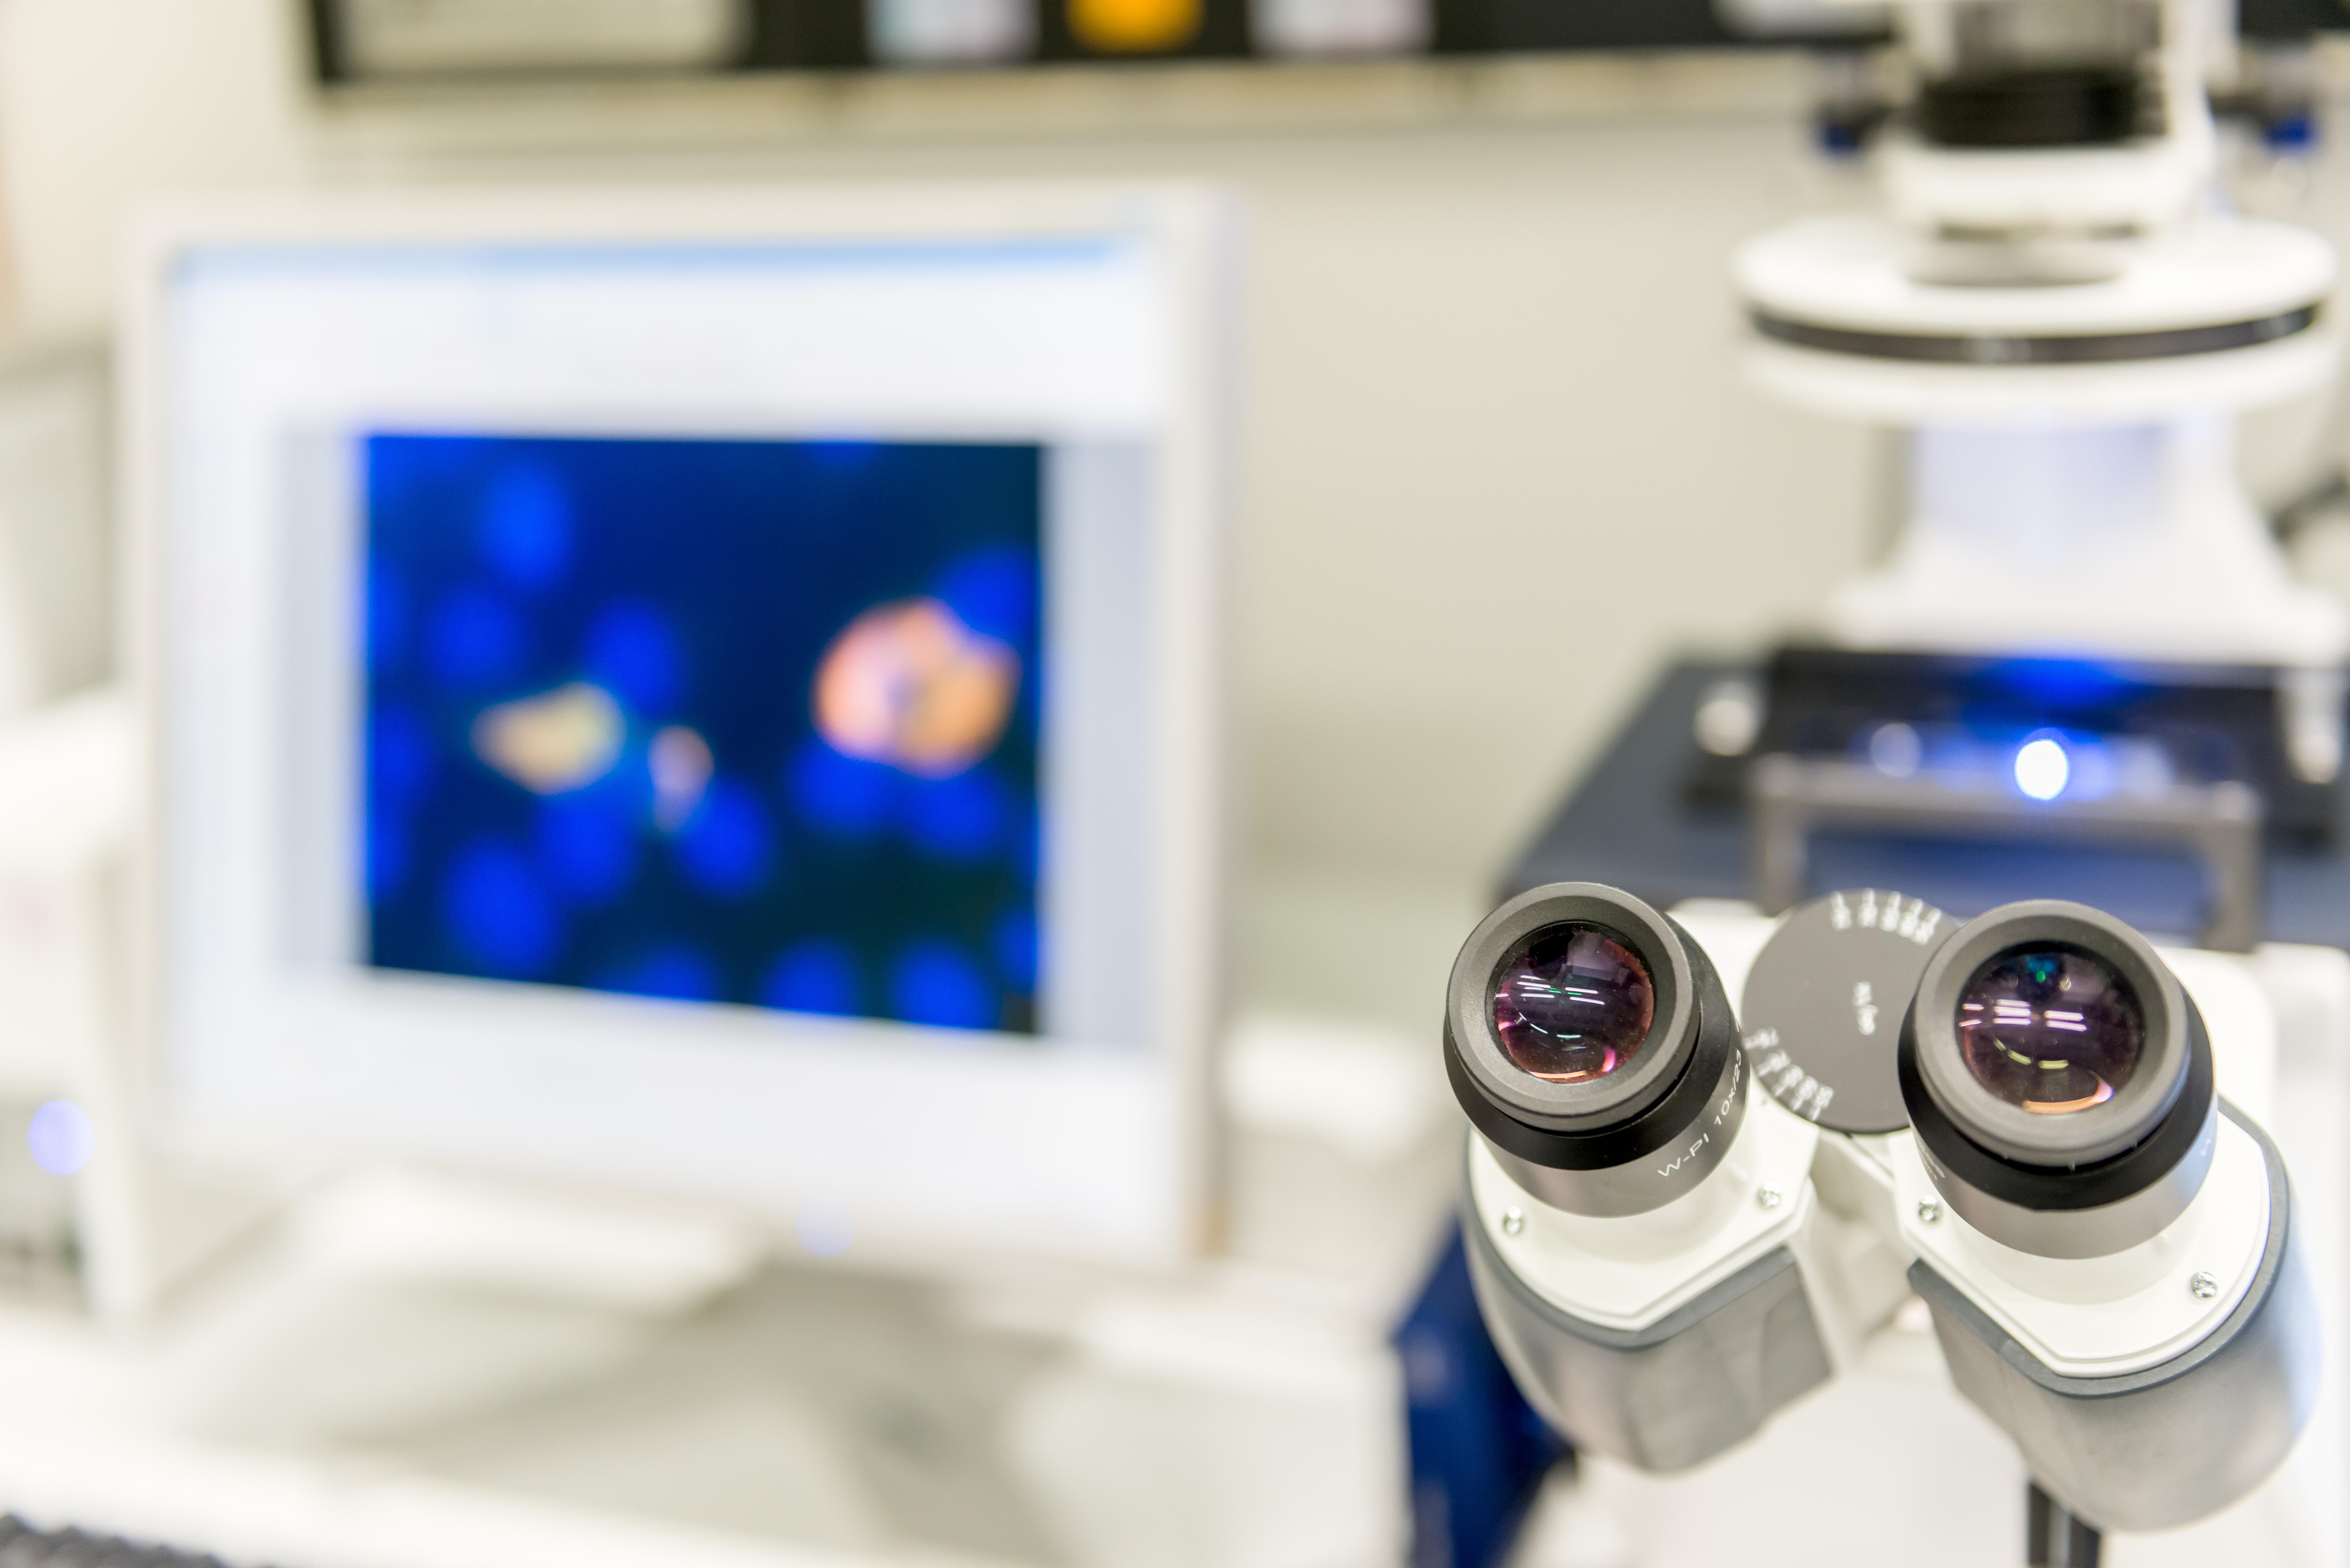 Institut für Humangenetik: Prof. Zerres